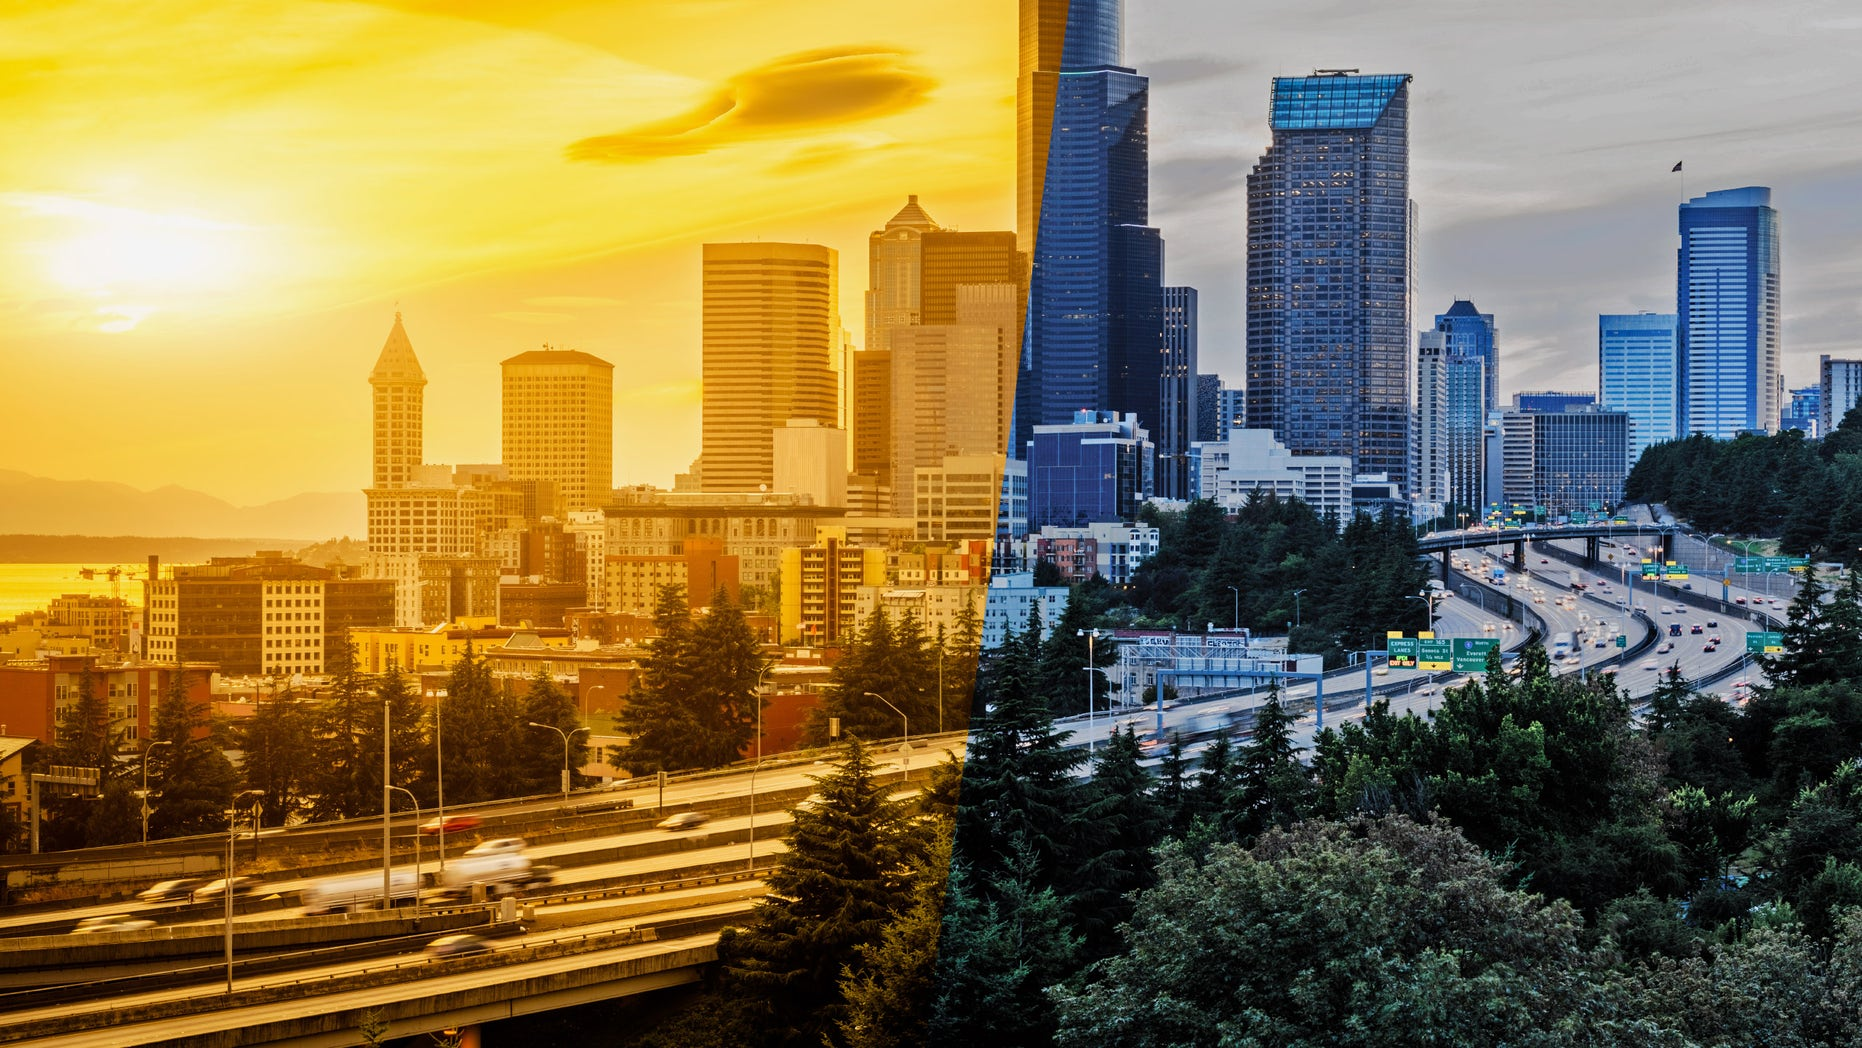 Seattle in sun and rain